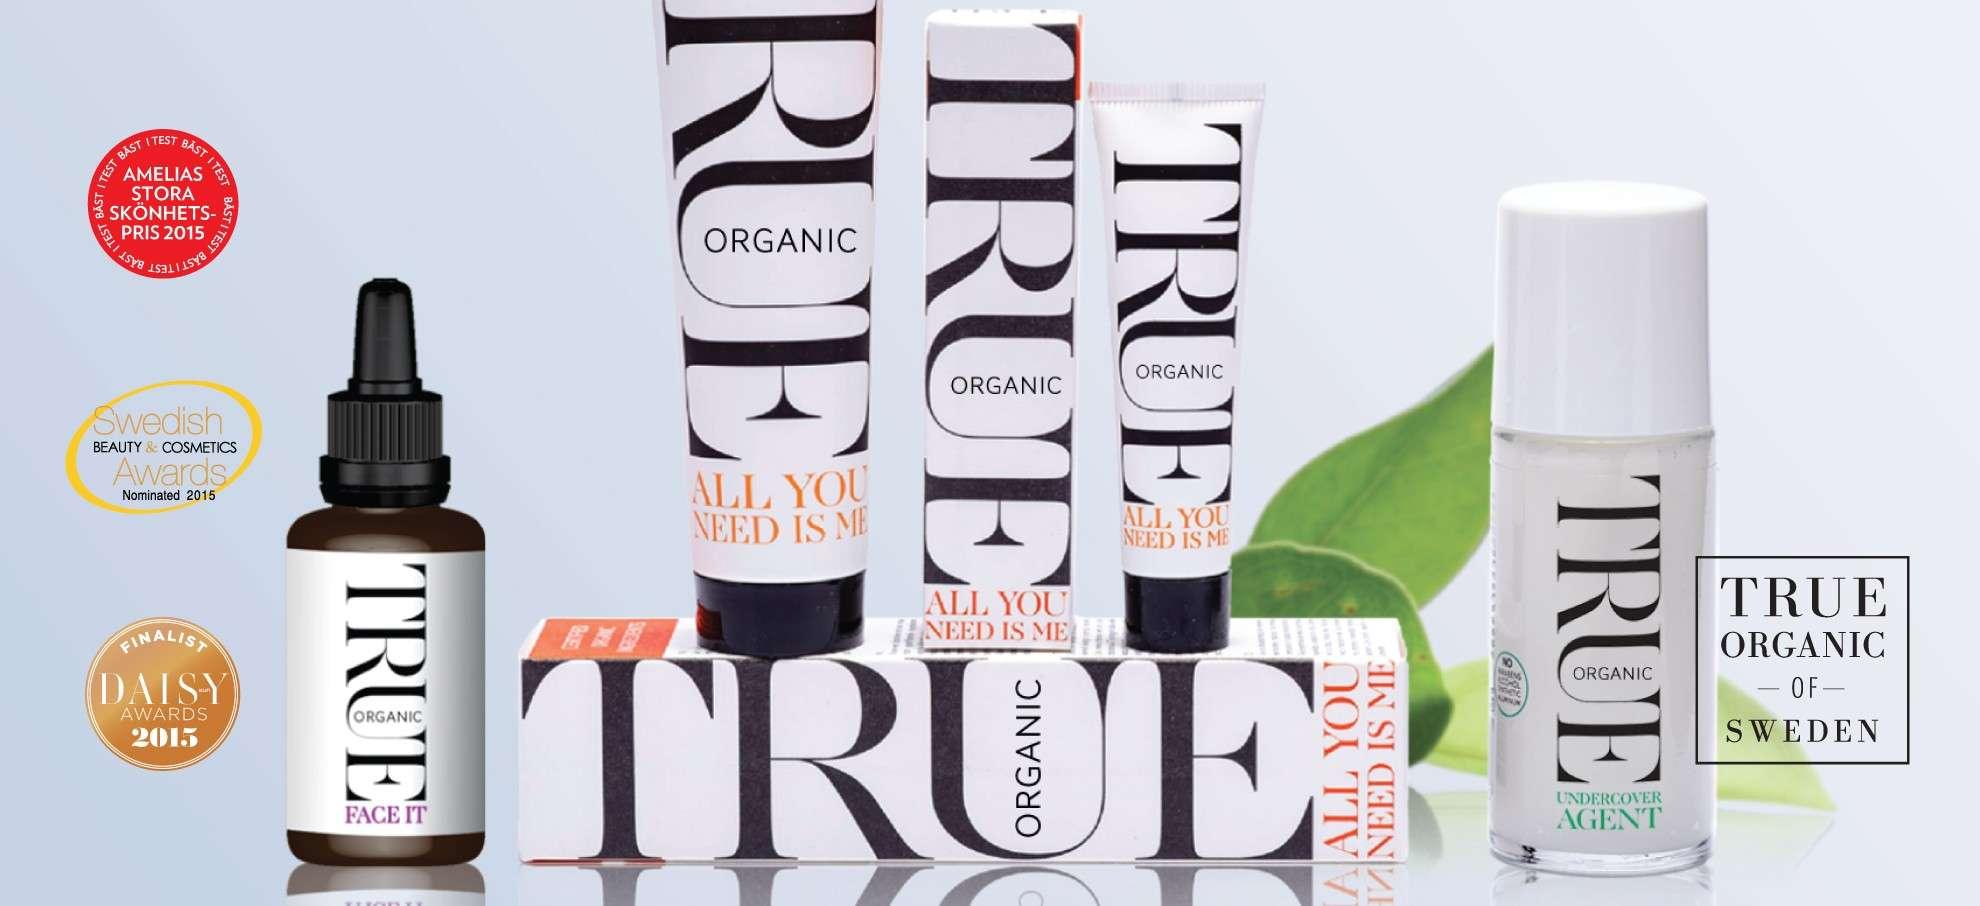 Organic cosmetics - True organic of Sweden